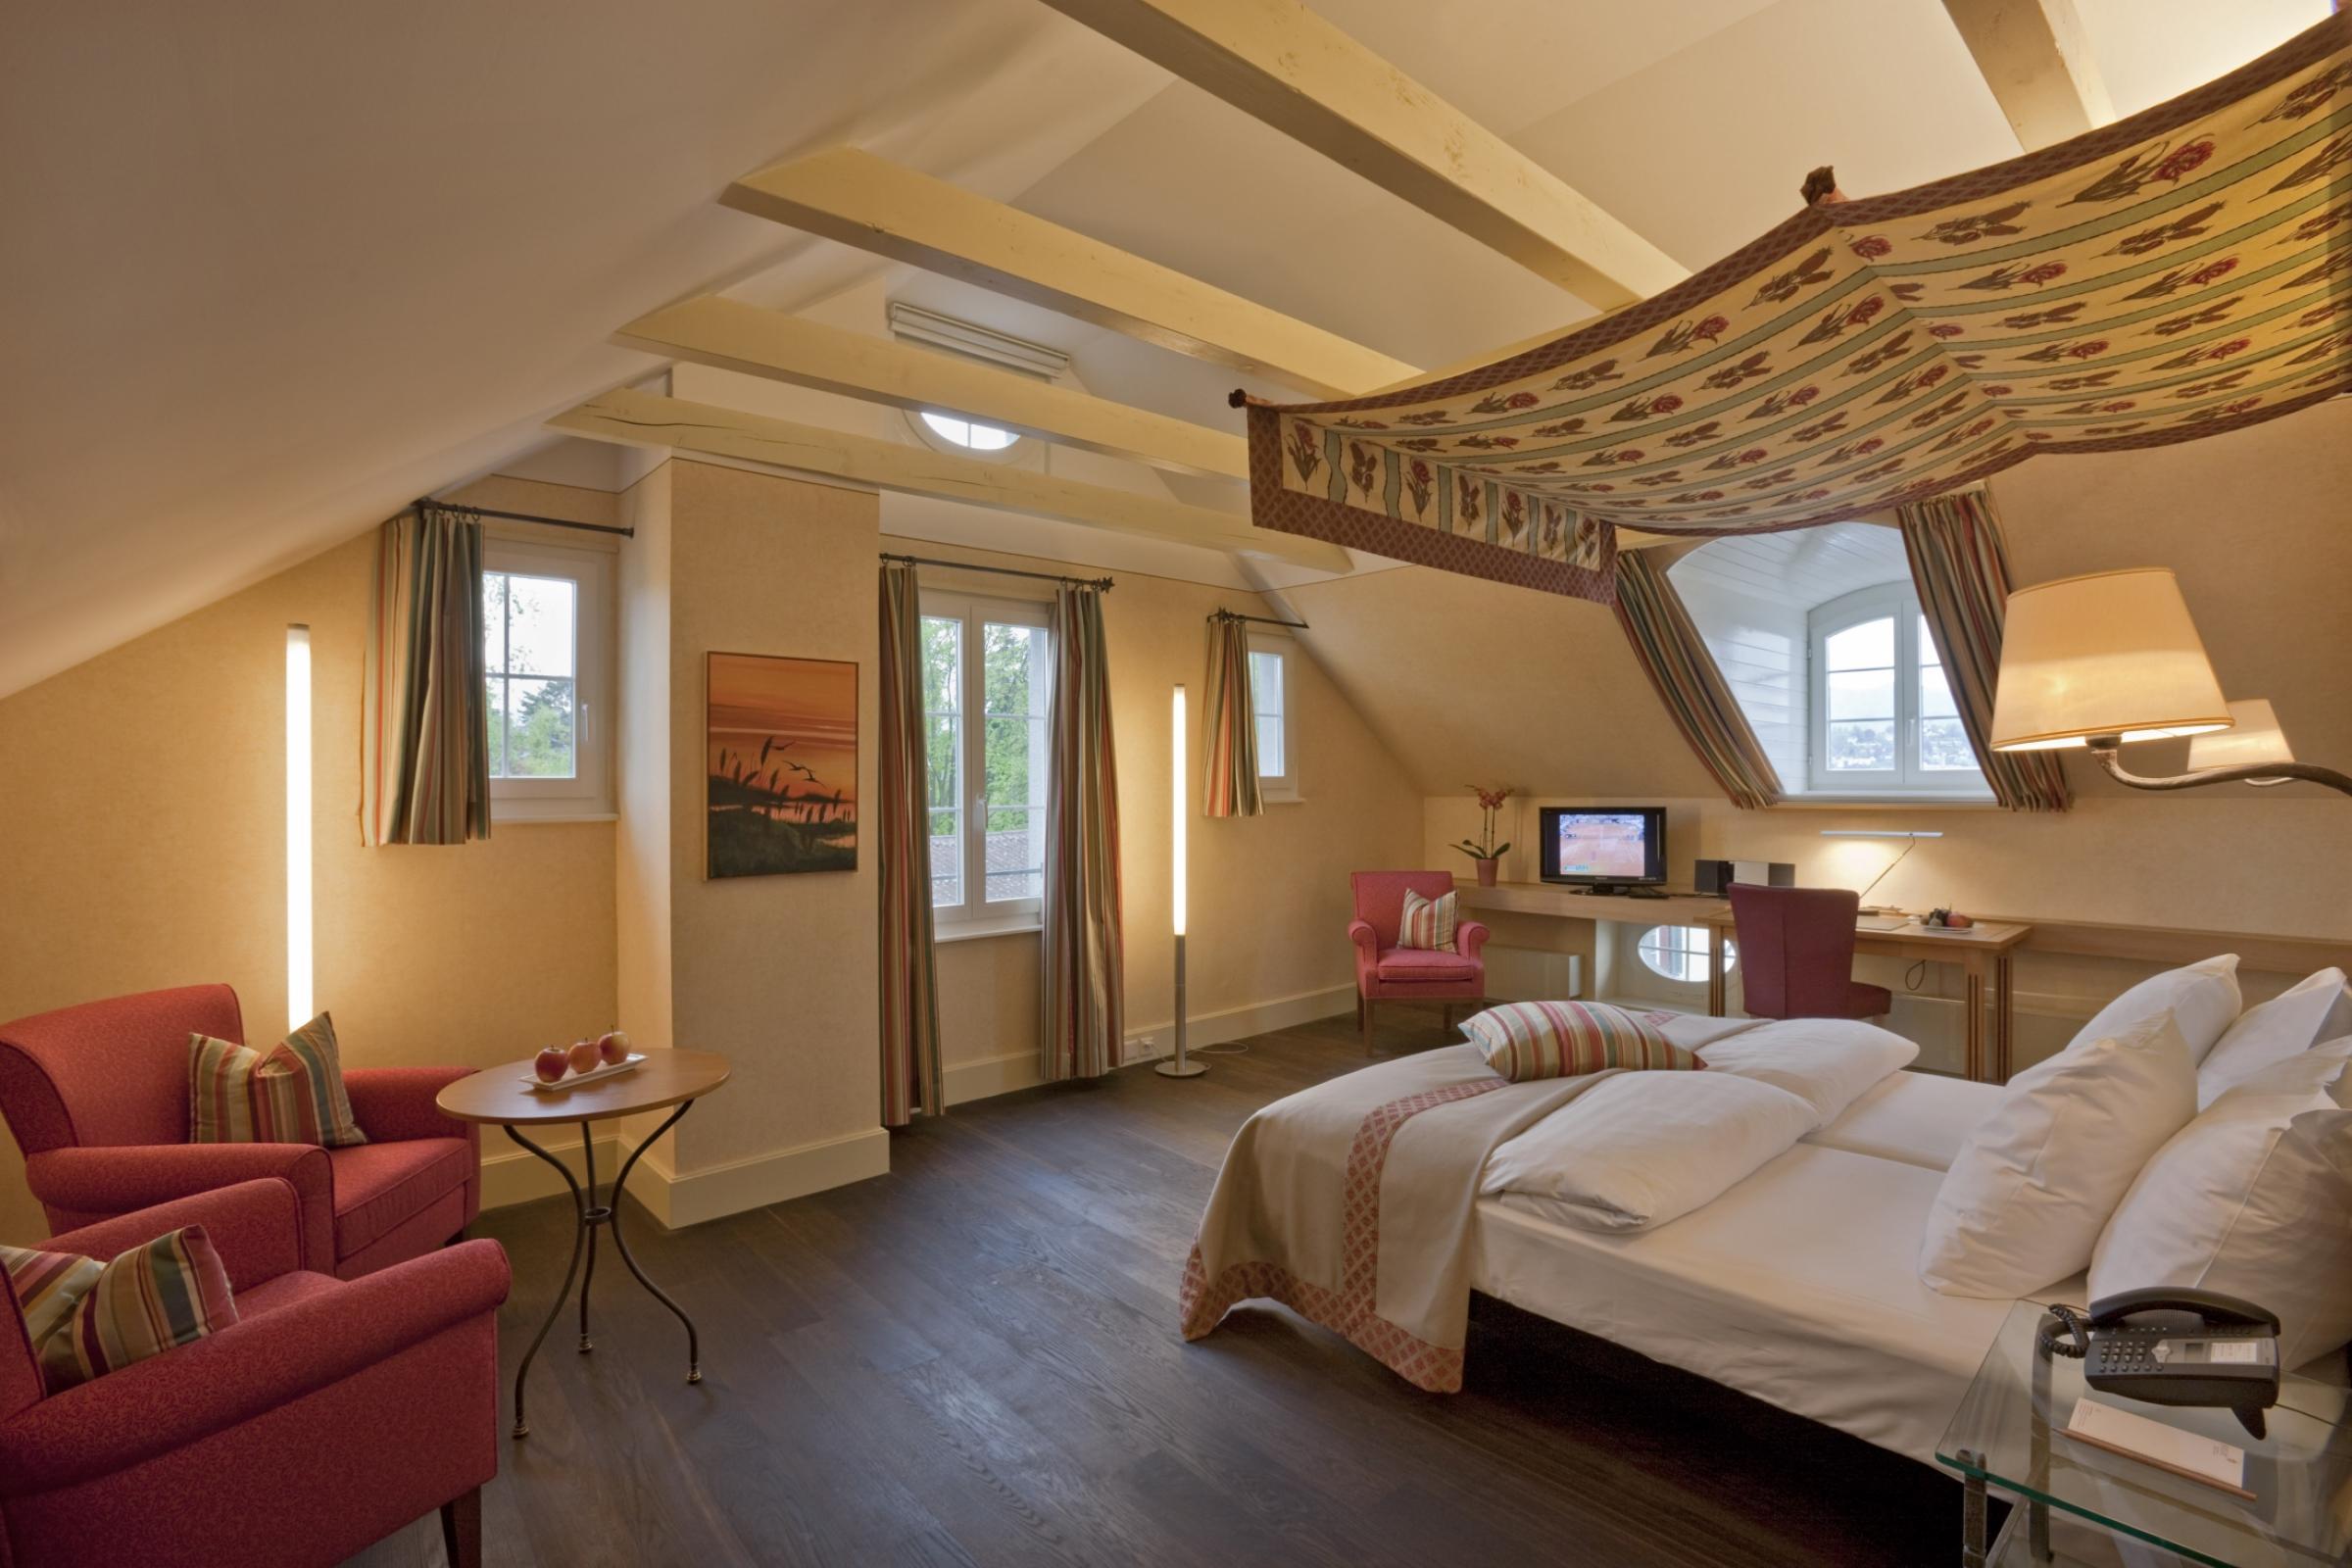 Romantik Seehotel Sonne 230 3 6 1 Kusnacht Hotel